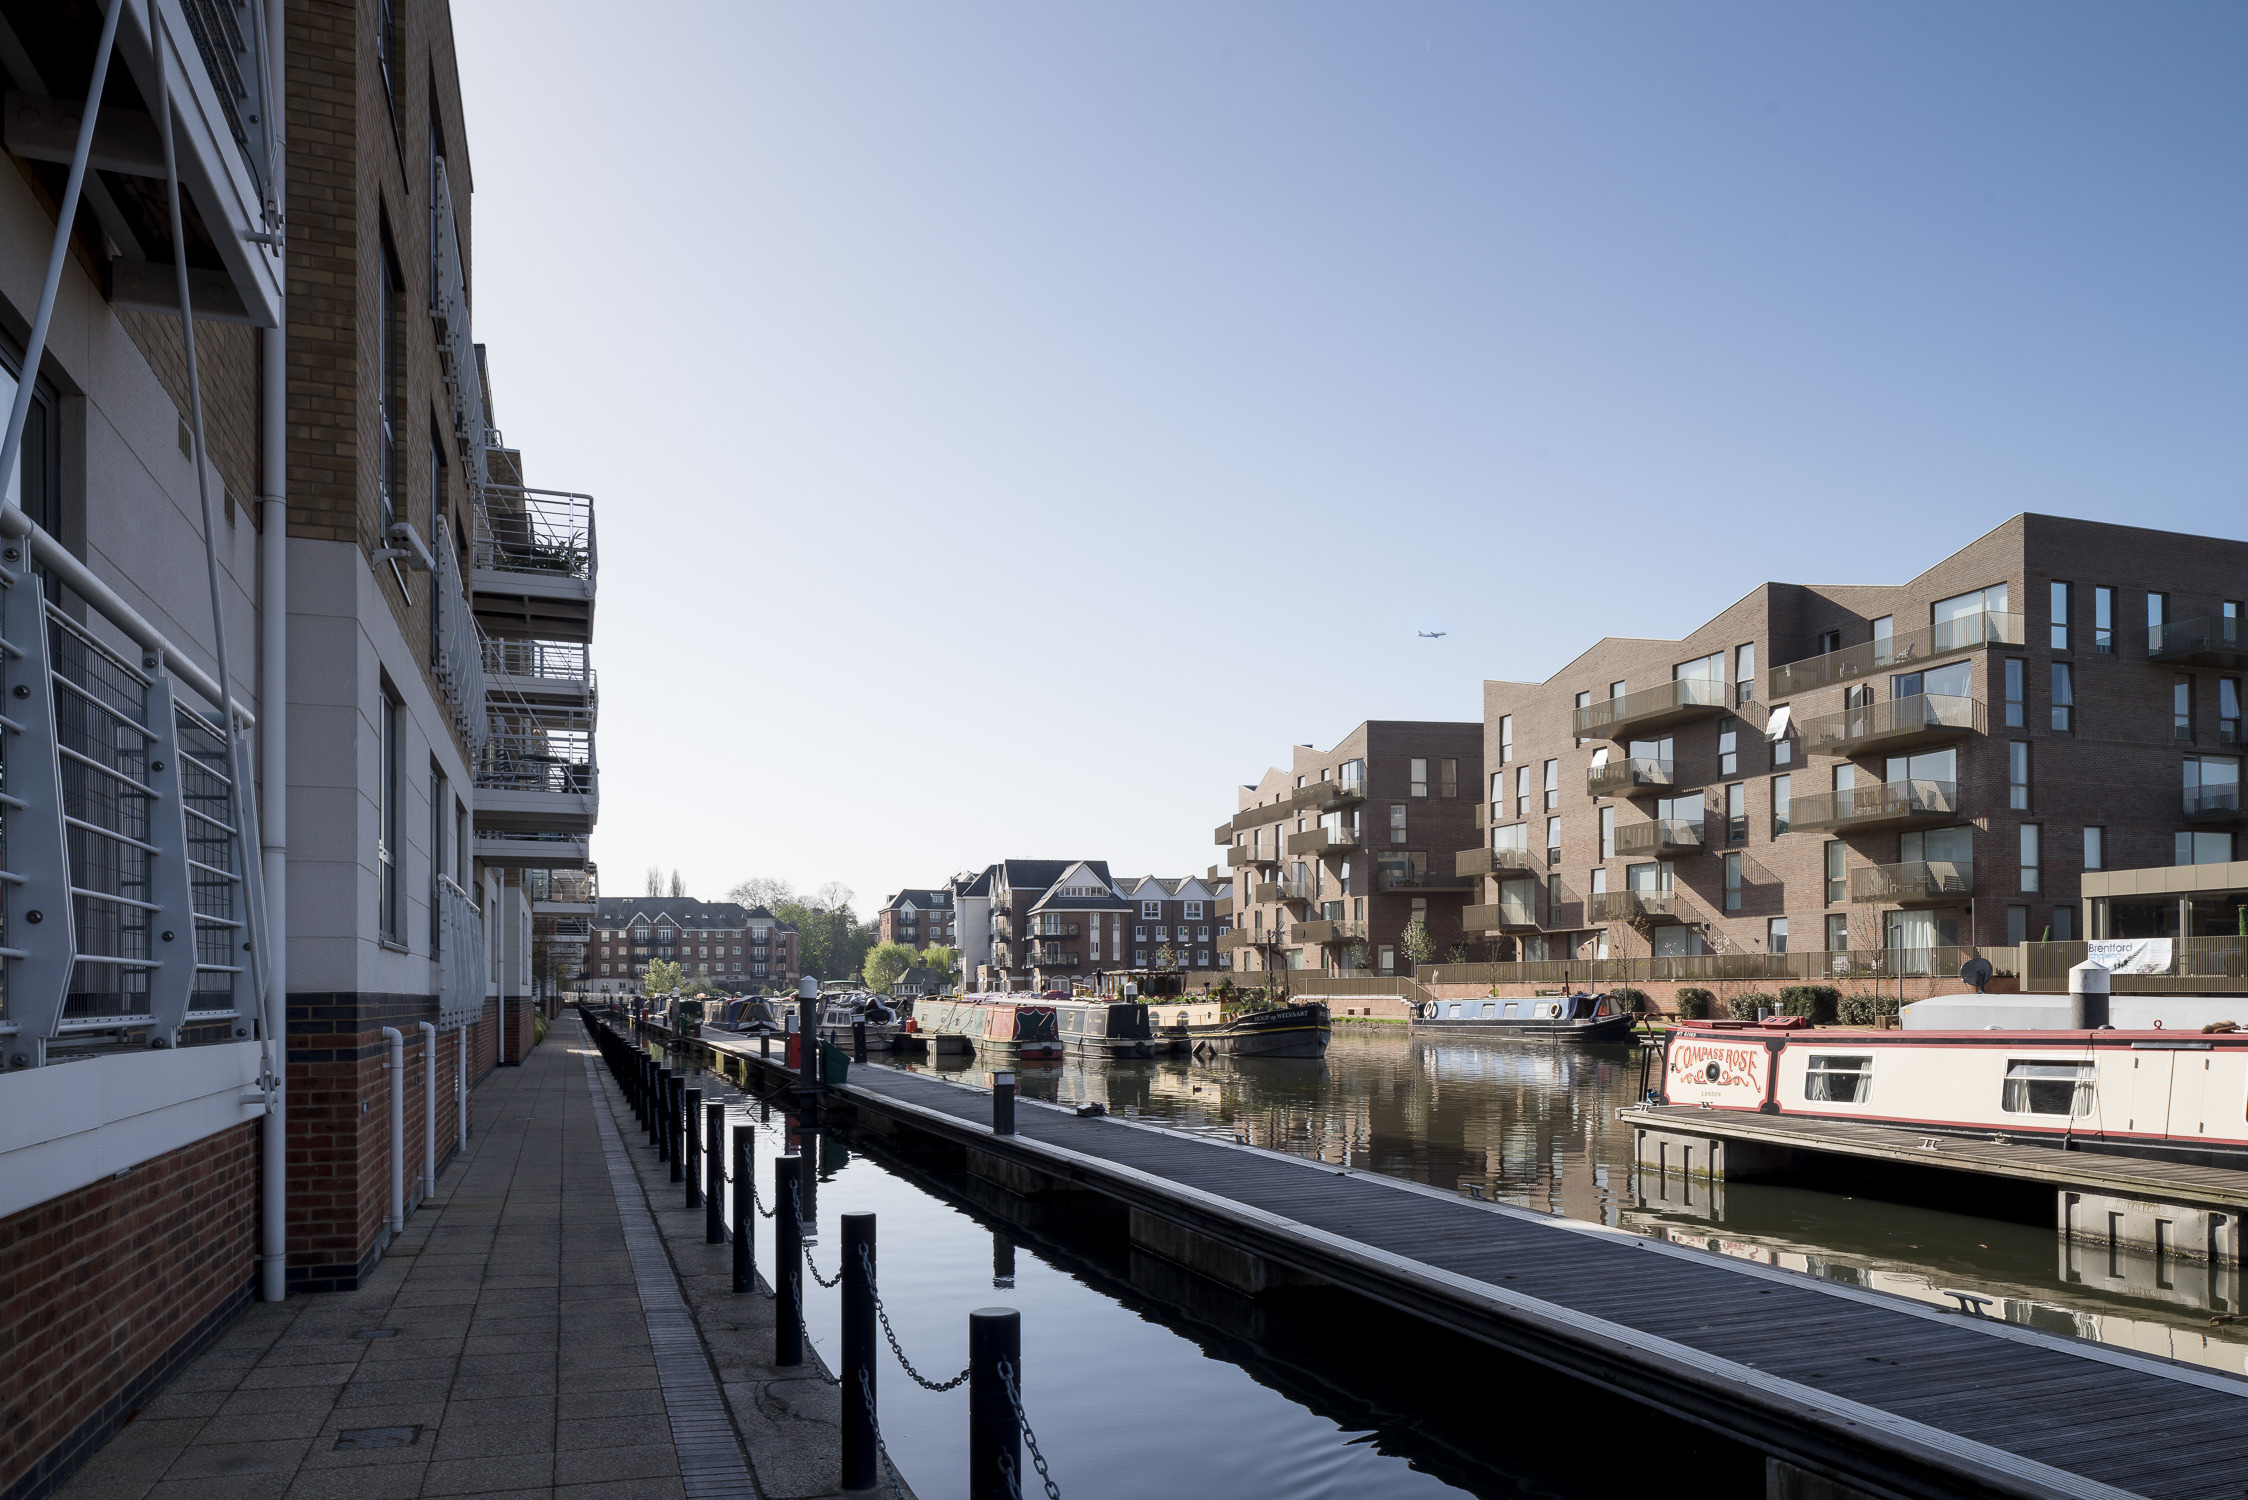 duggan-morris-brenrtford-lock-mark-hadden-amsterdam-architecture-photographer-architectuurfotograaf-.jpg